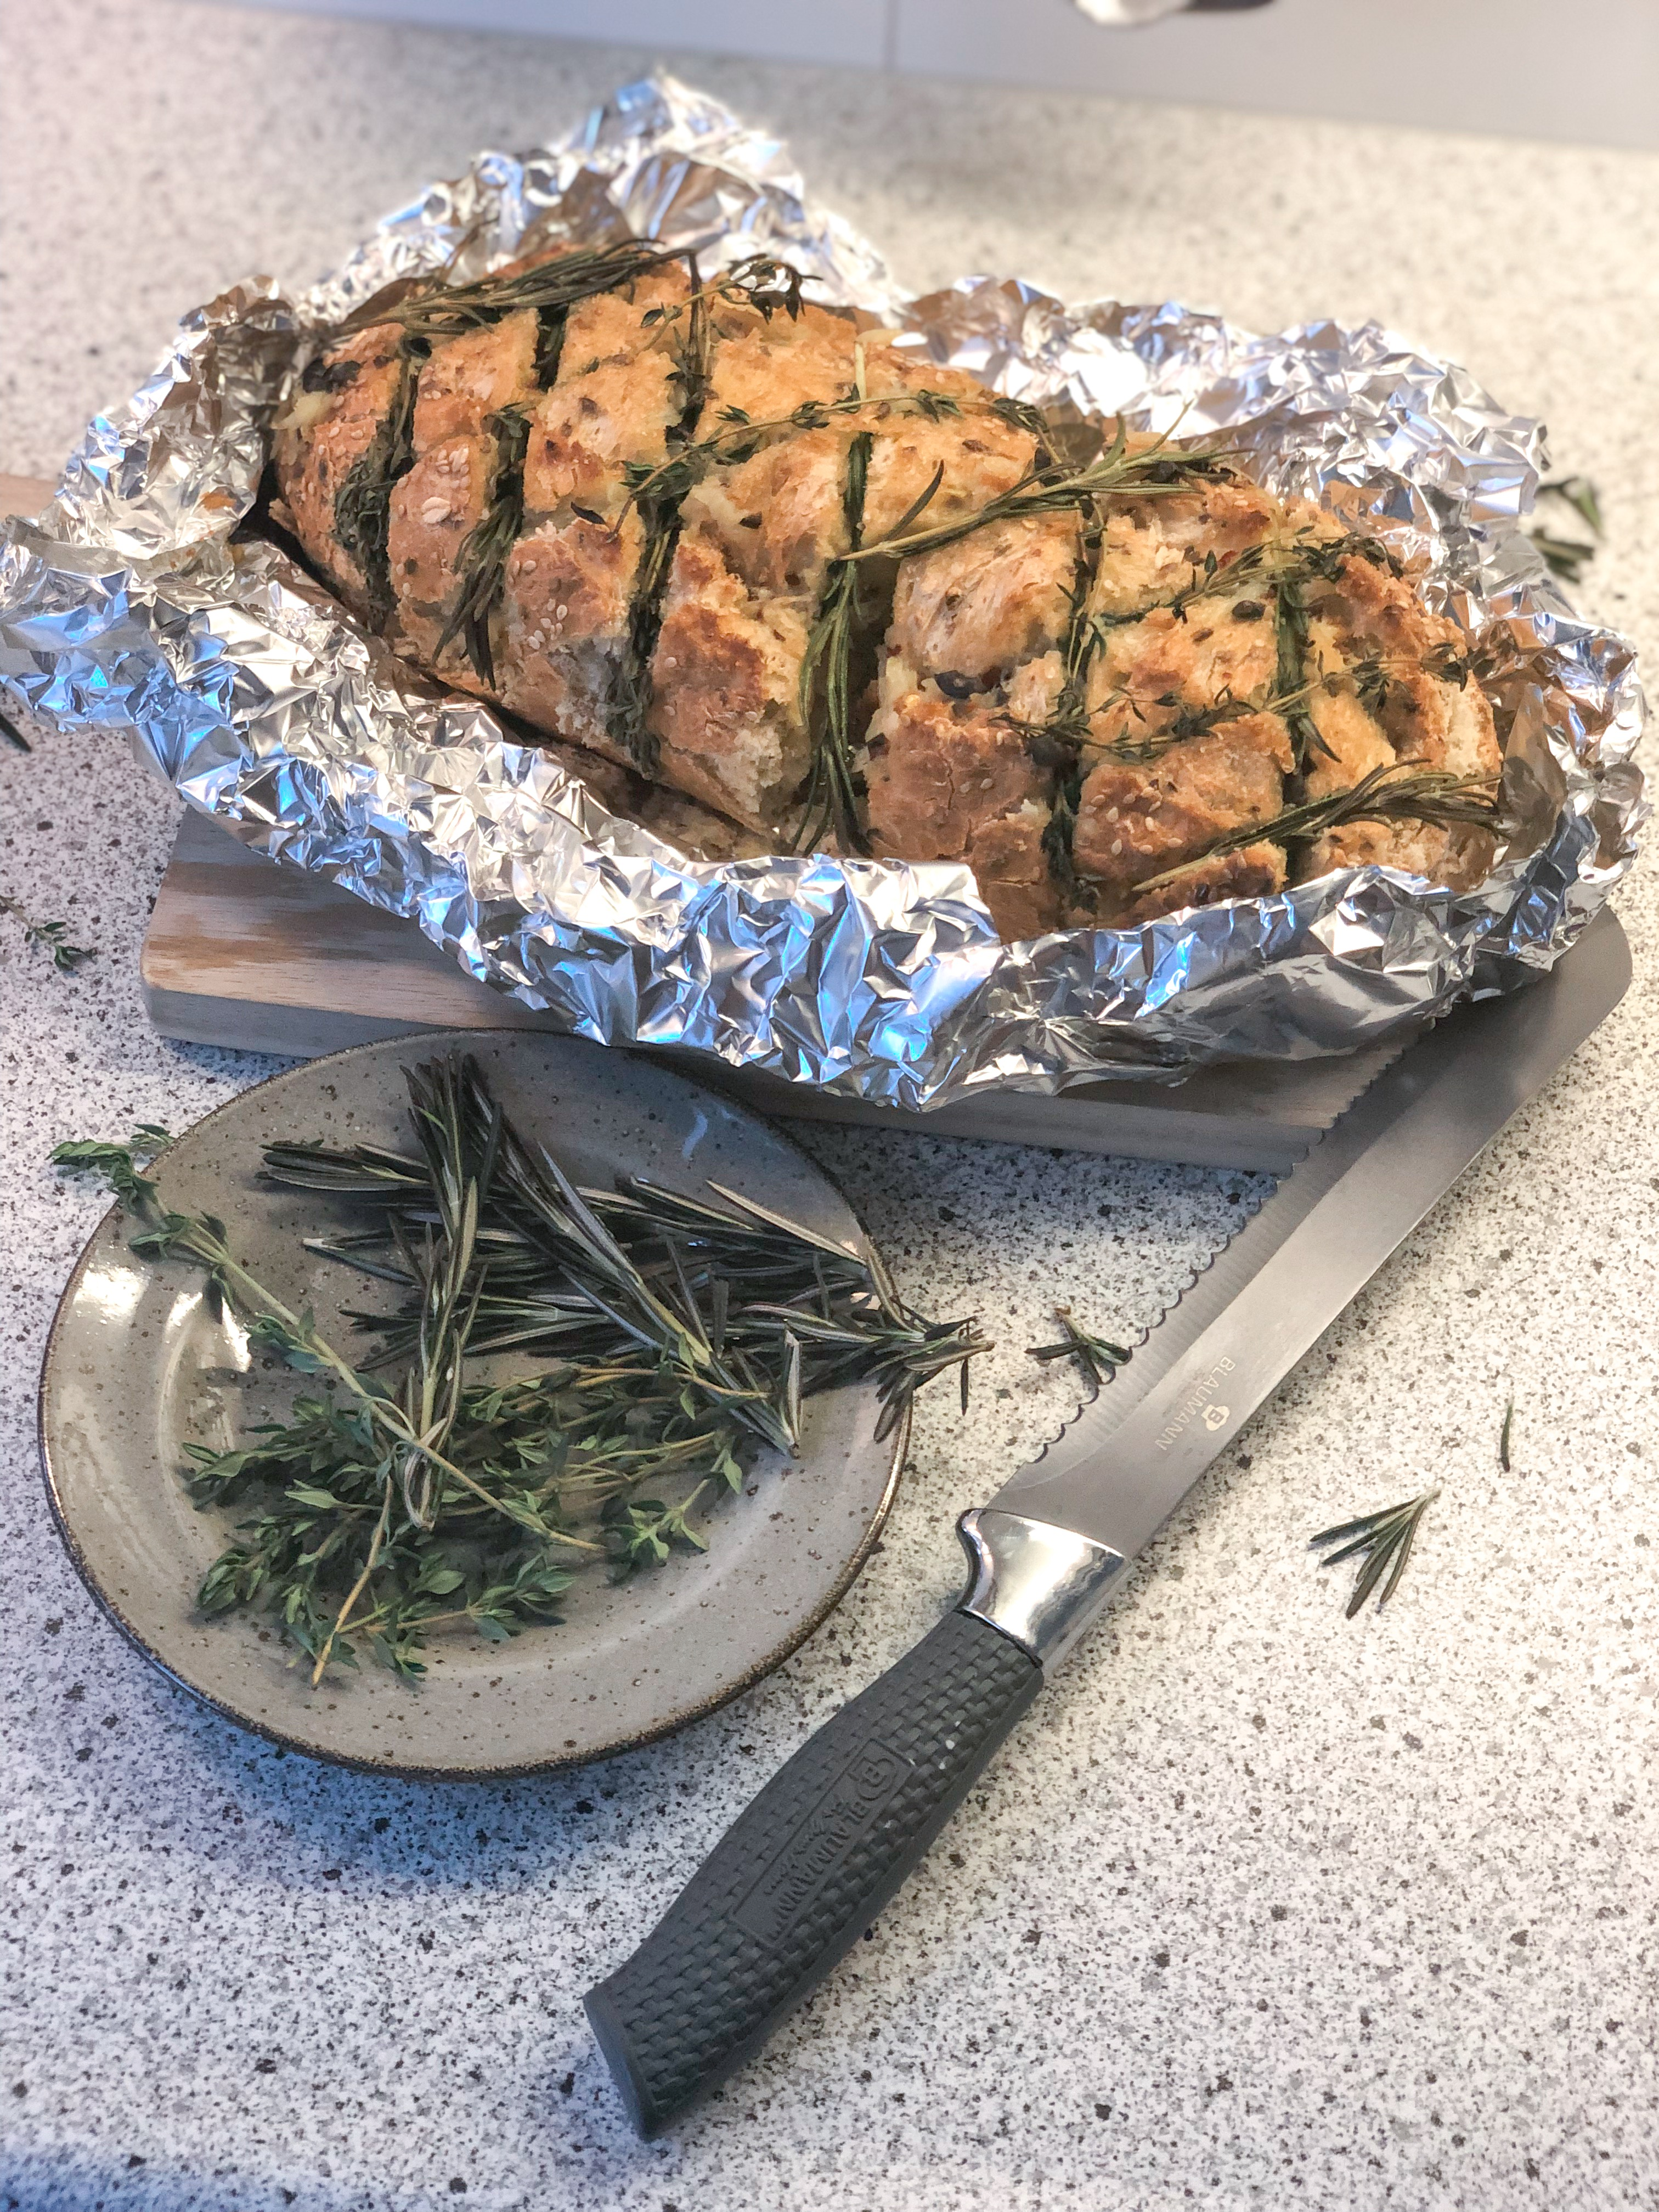 food, borrel, borrelbrood, eten, xmariekie, foodie, foodblogger, recept